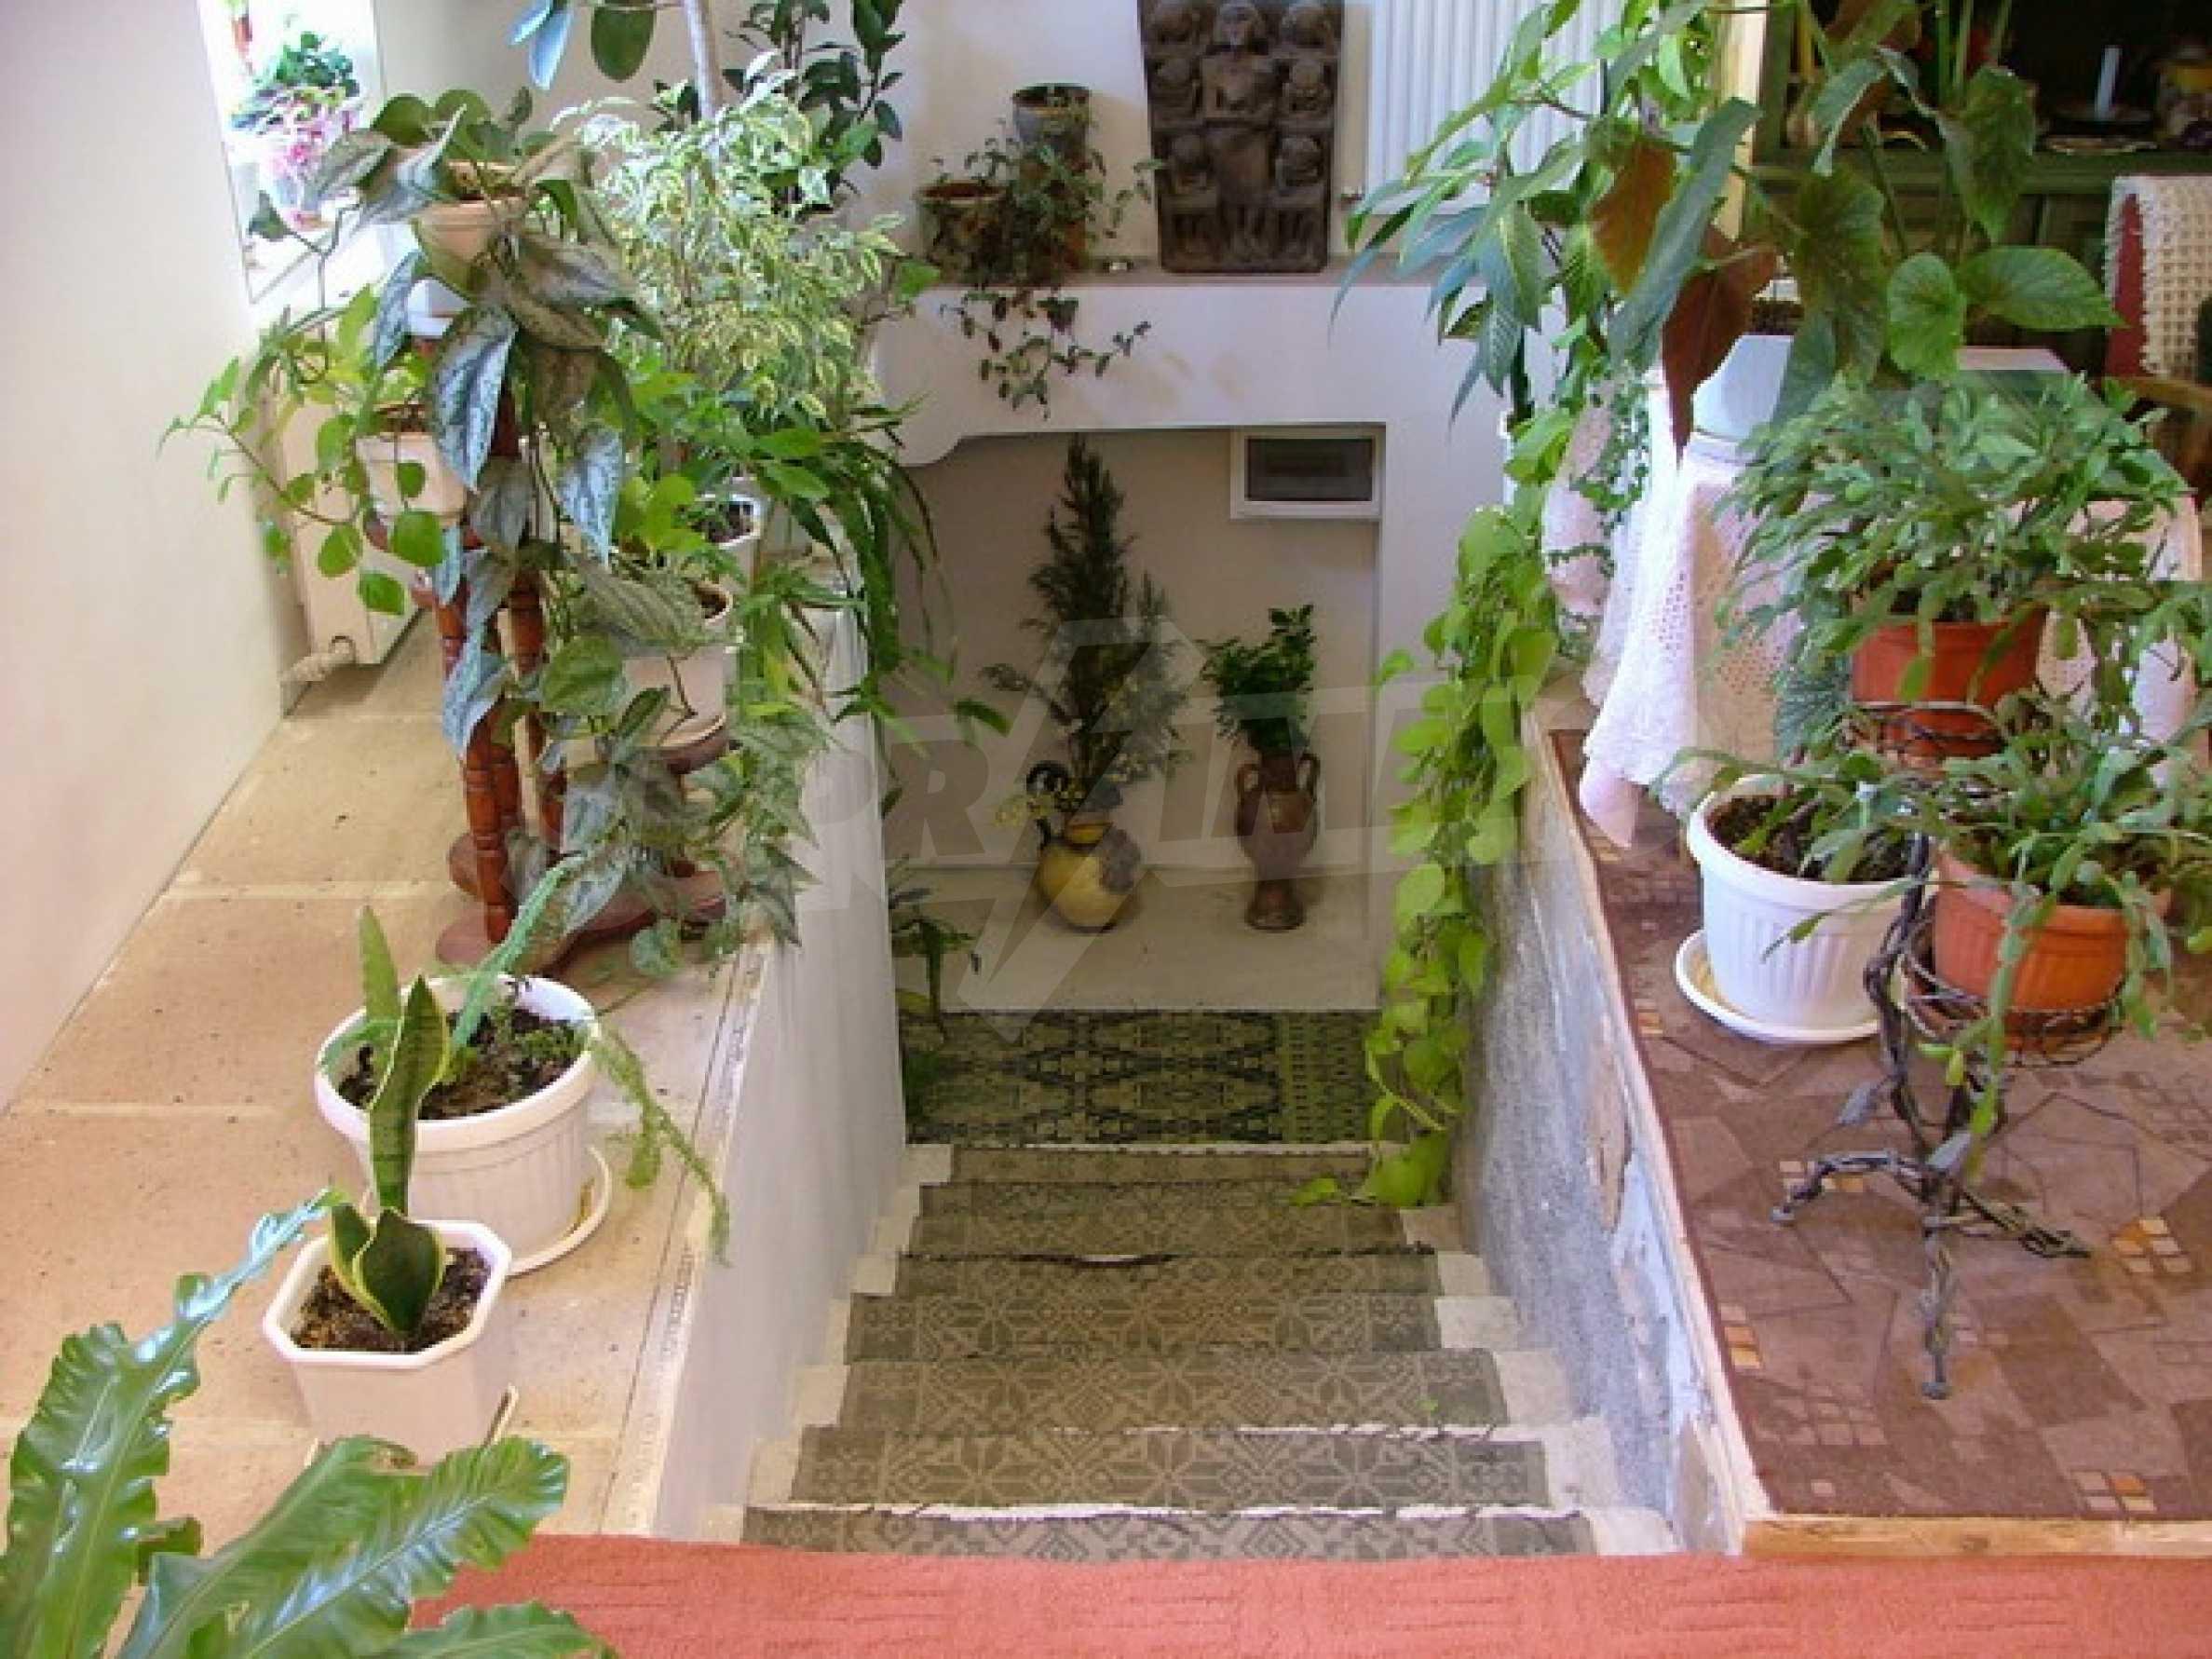 Stilvoll renovierte Villa 12 km entfernt. von Veliko Tarnovo 13